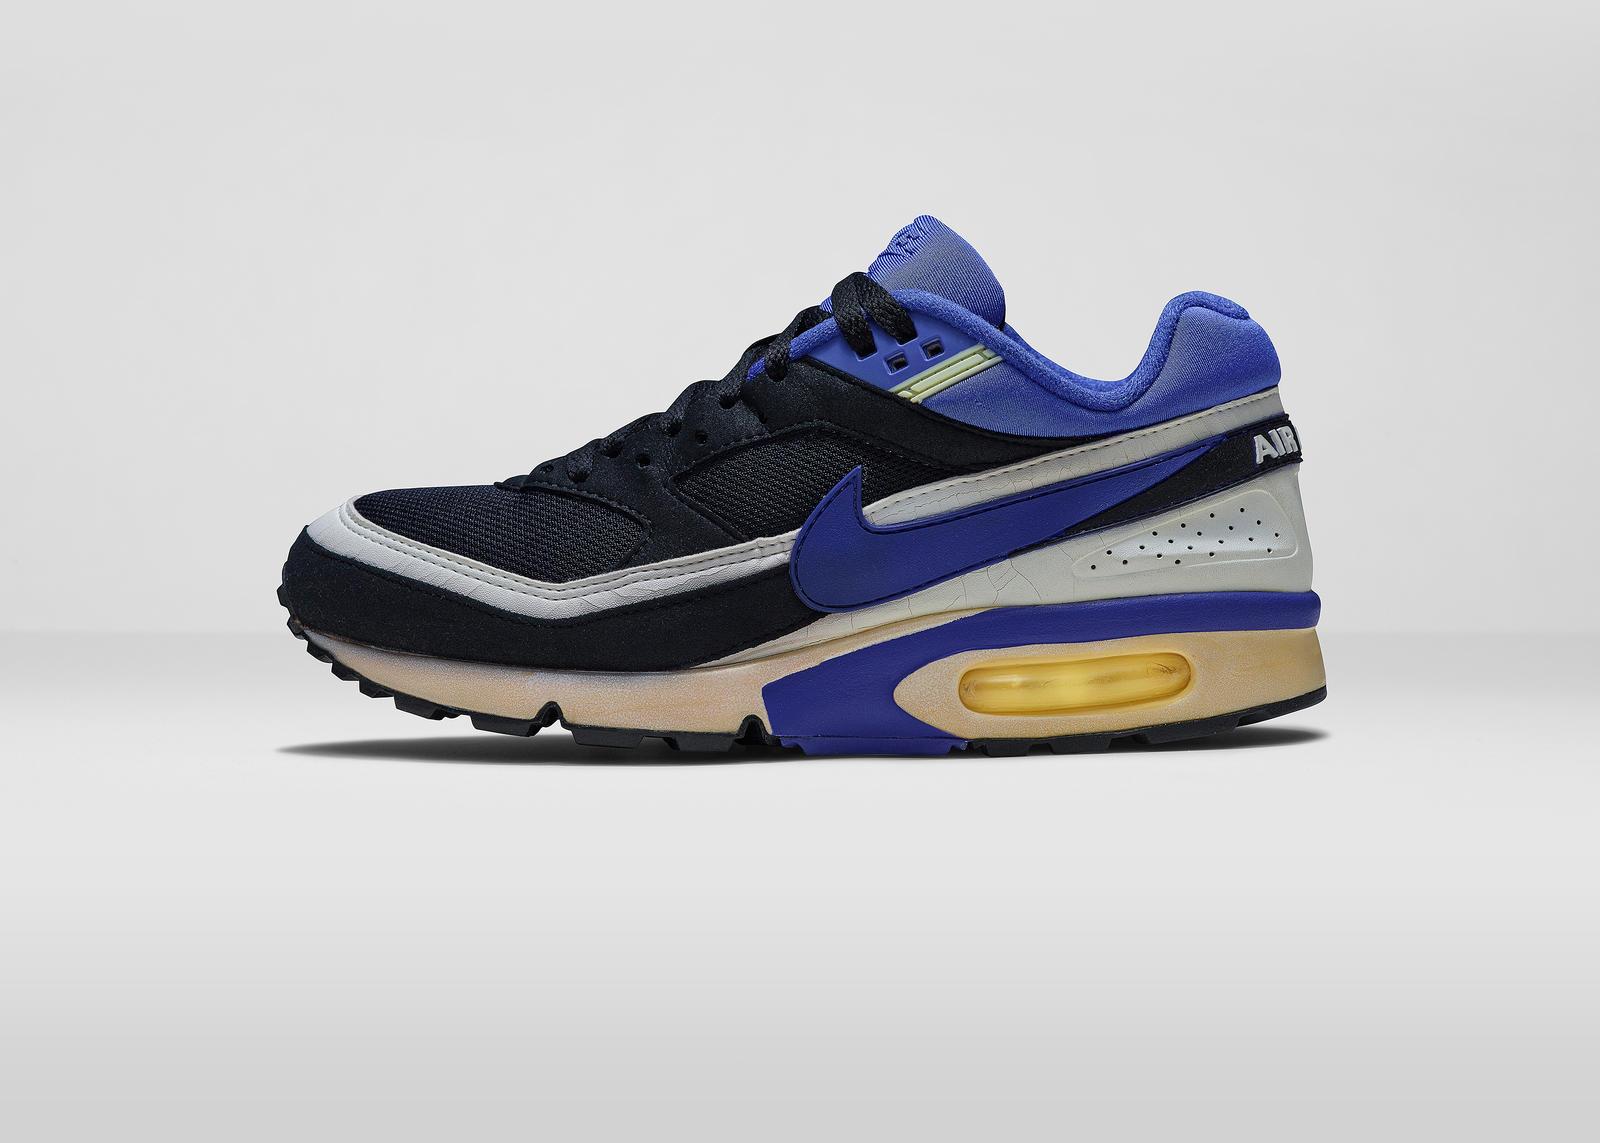 separation shoes 0aea7 531dc Acheter air max 1992 pas cher